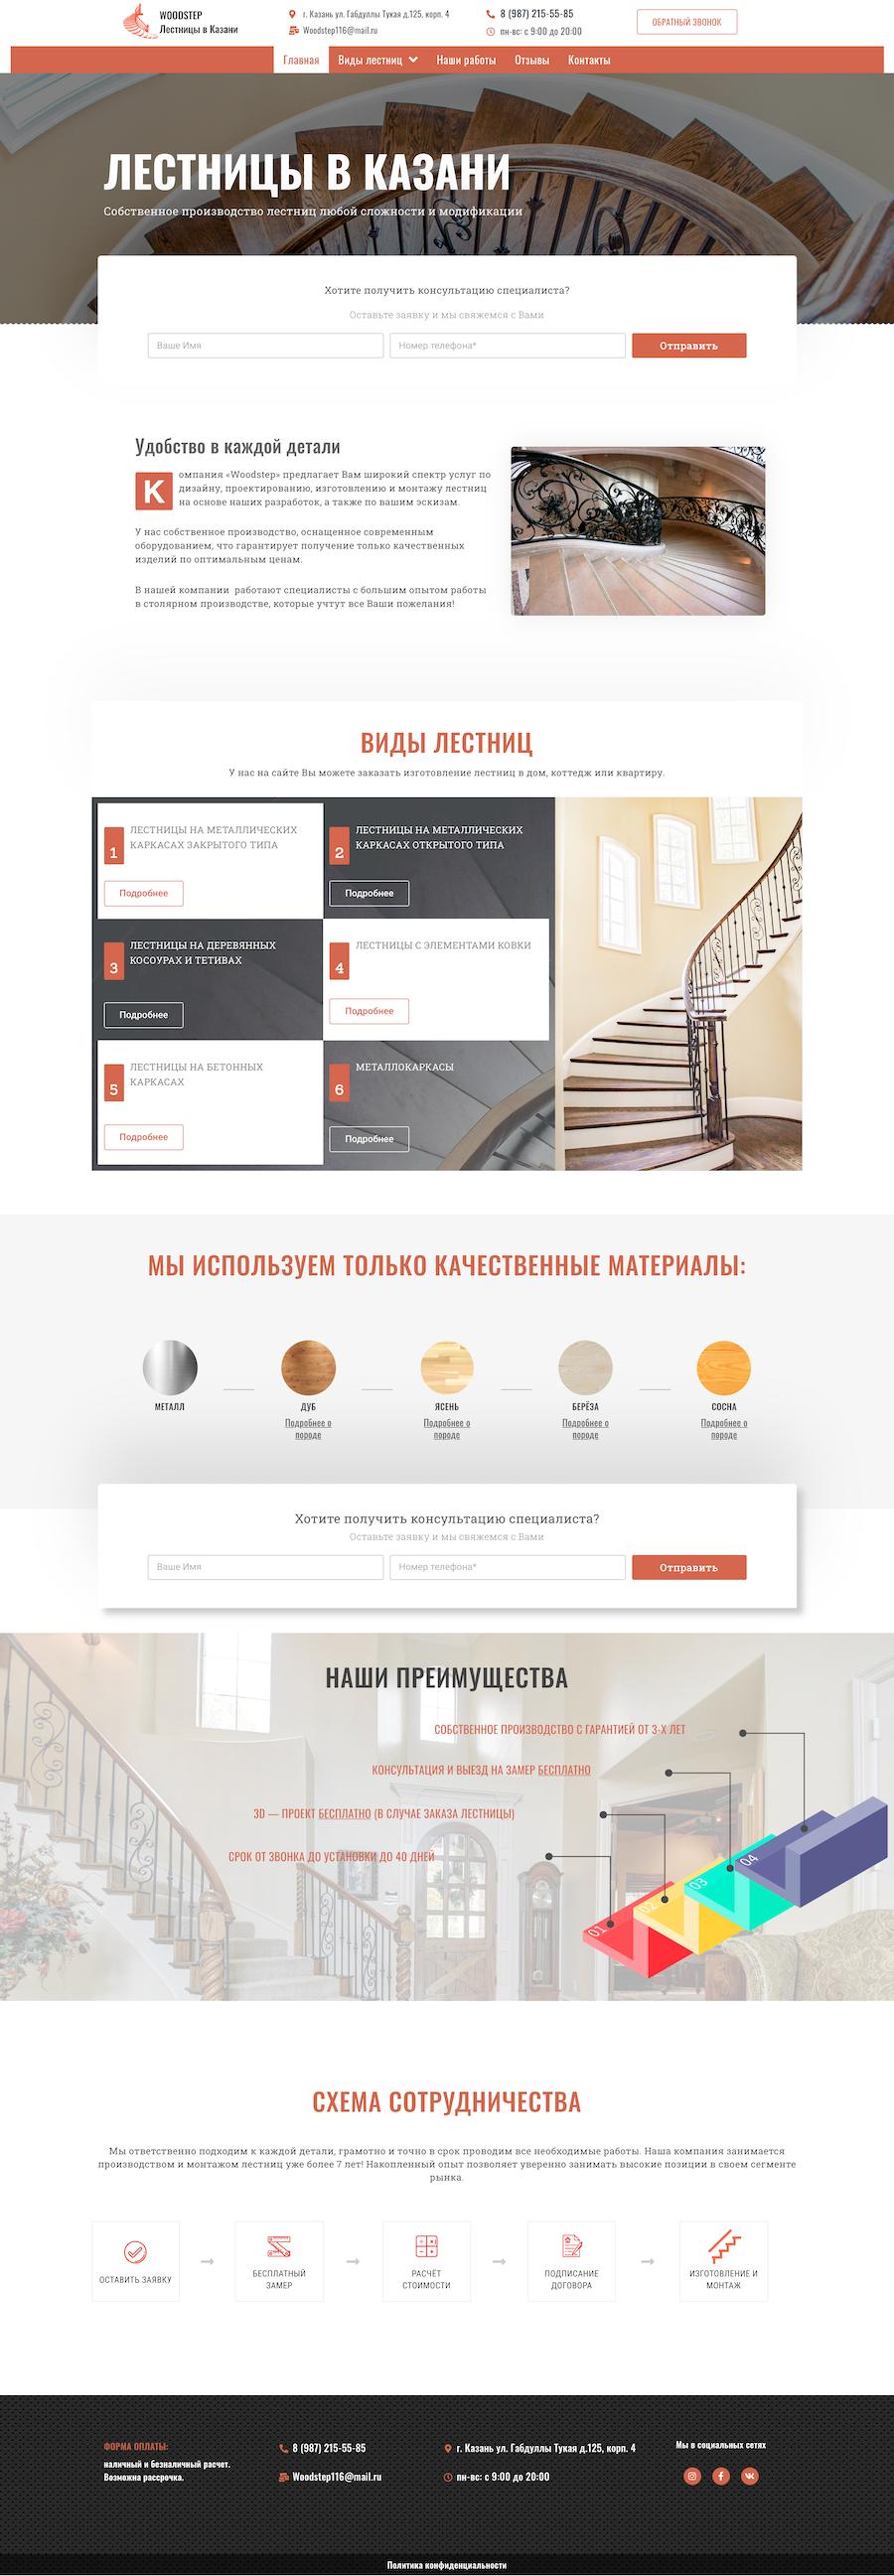 Изготовление и монтаж лестниц в Казани